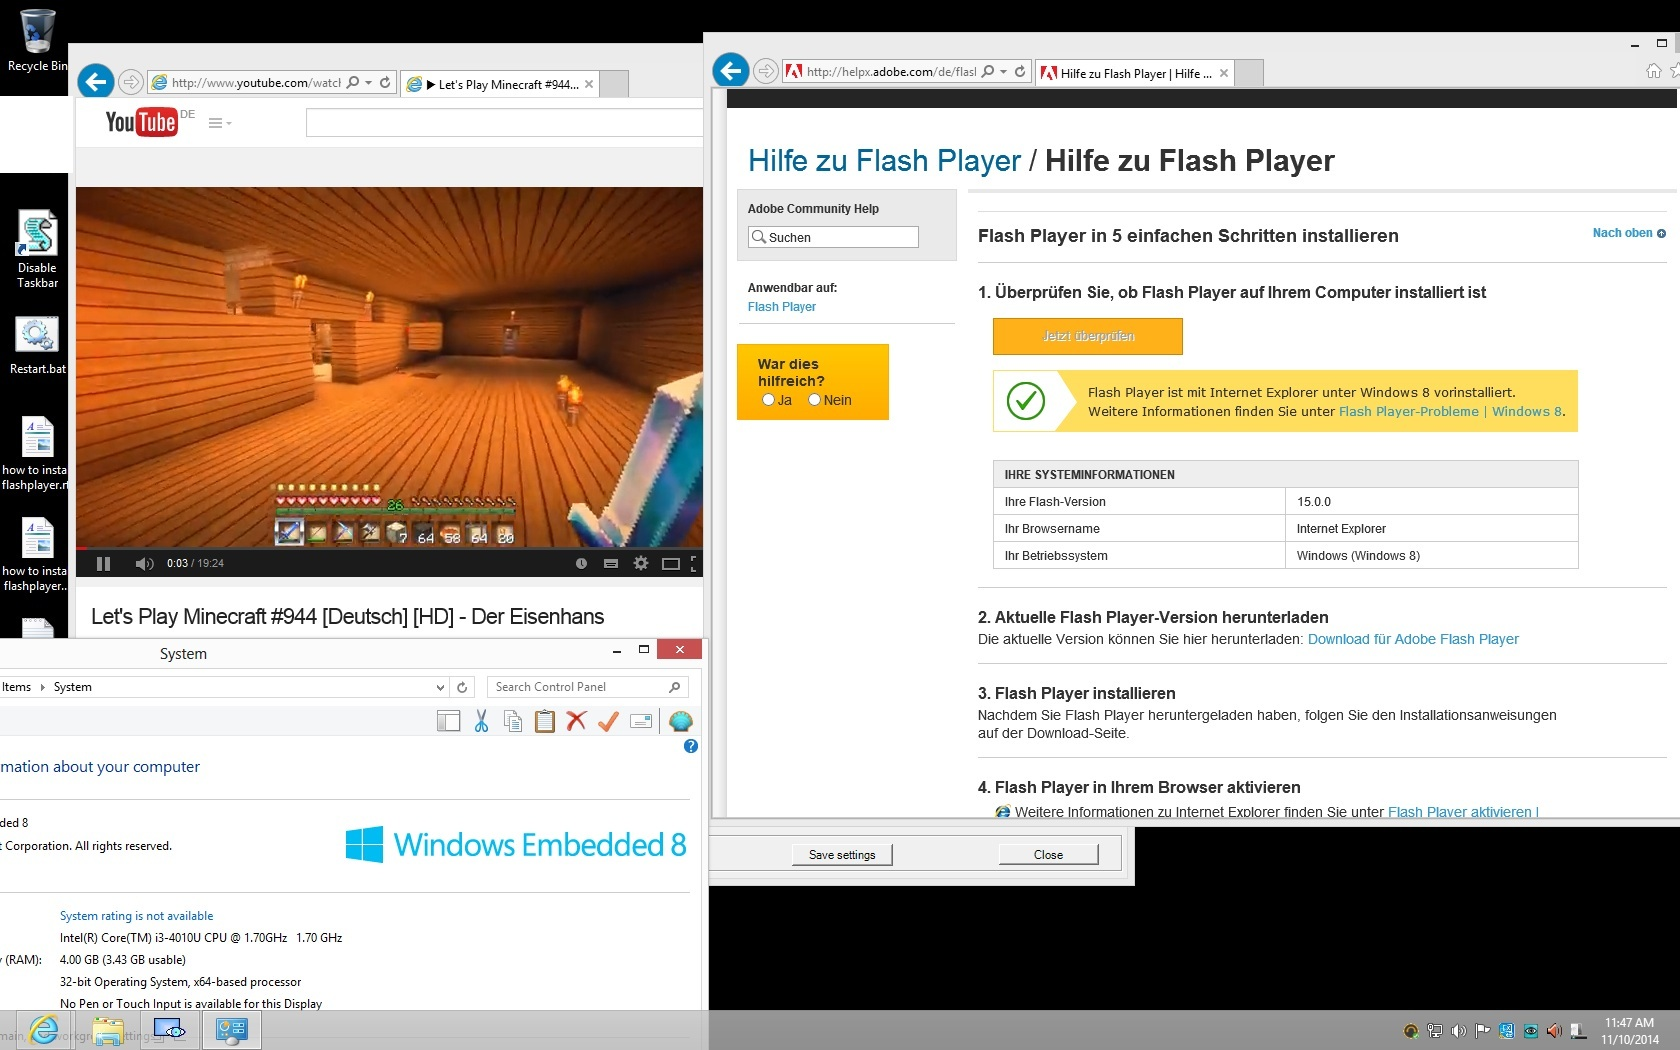 windows-8-embedded-flashplayer-works